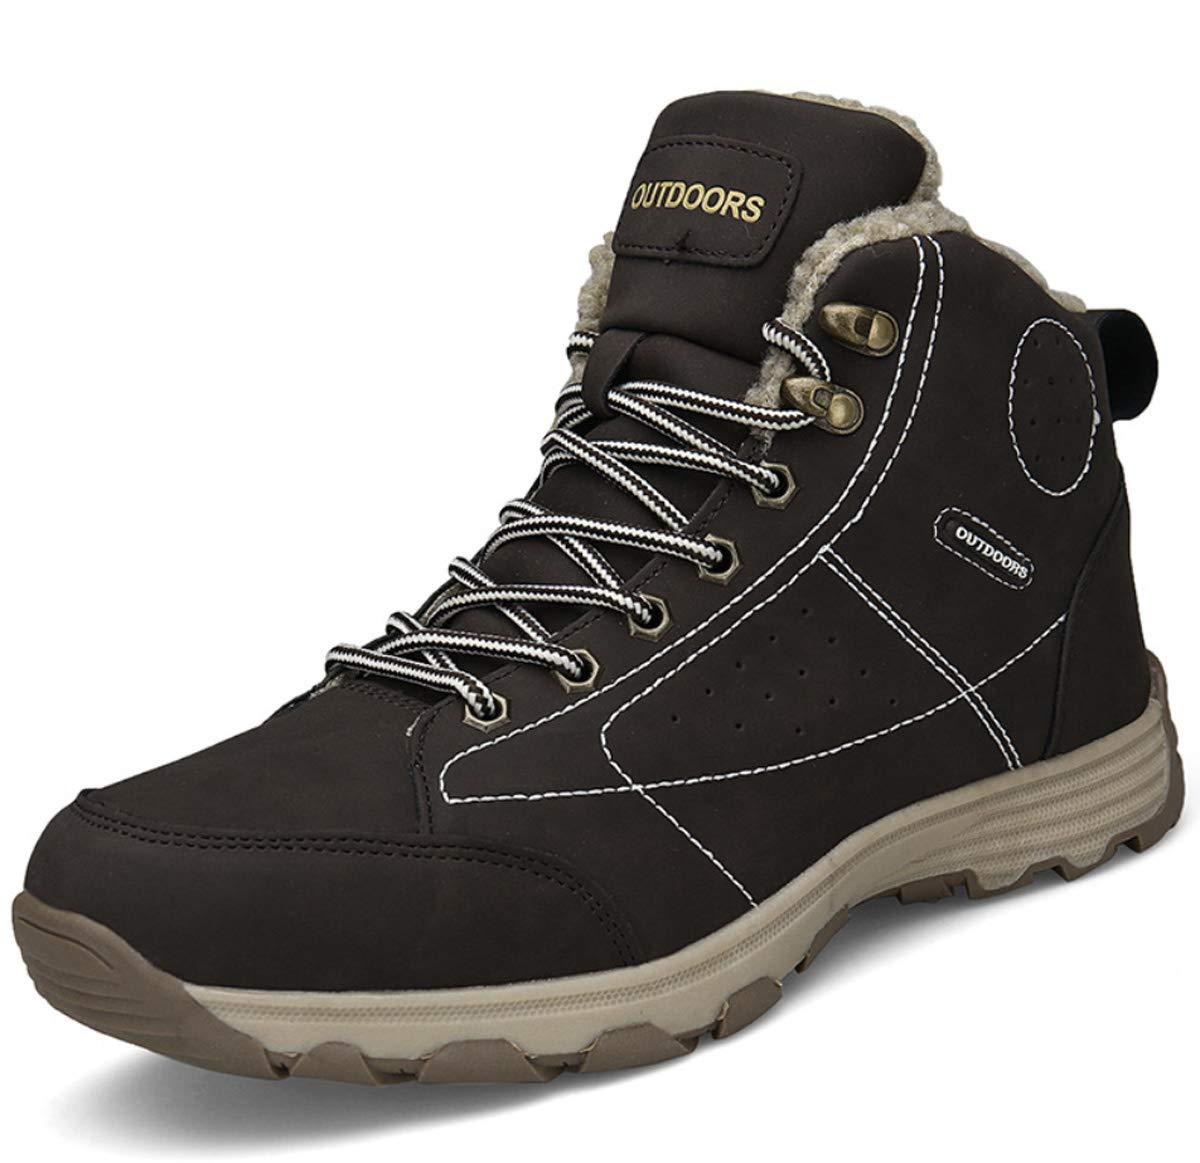 DANDANJIE Herren Turnschuhe mit Winter High Top Warme Wanderschuhe Bequeme Schuhe Outdoor Sports Snow Stiefel